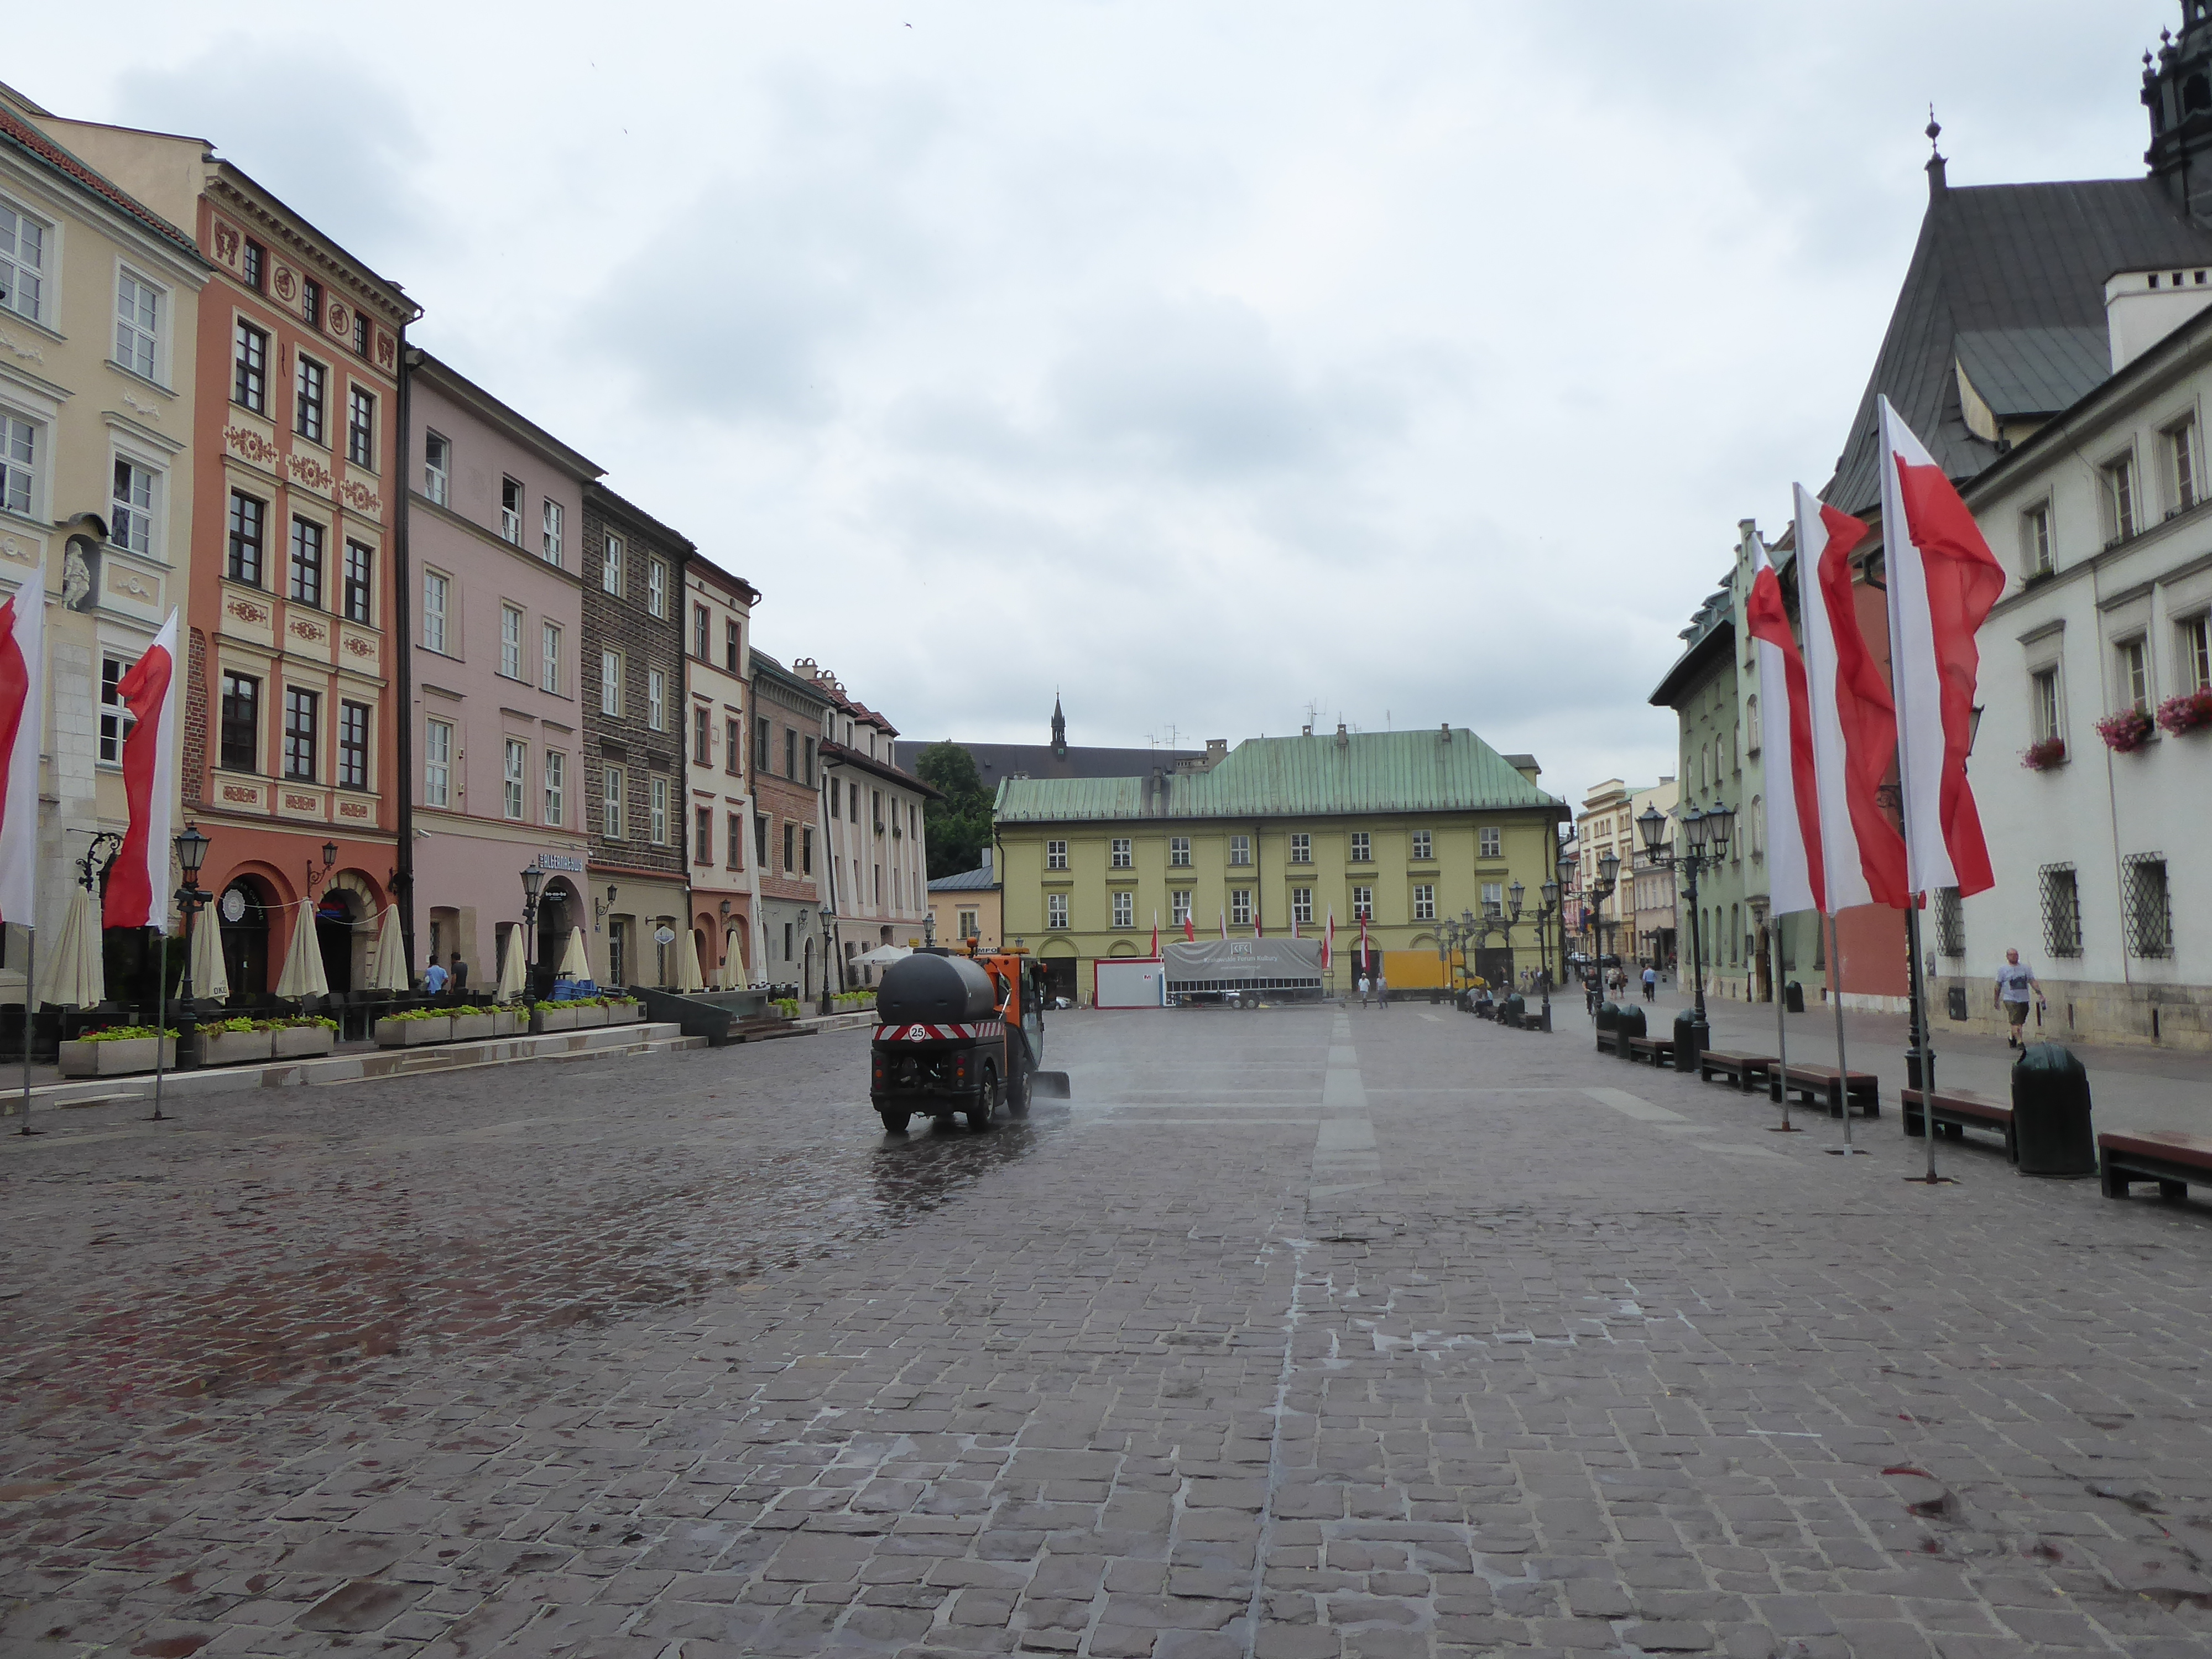 Krakow square 02